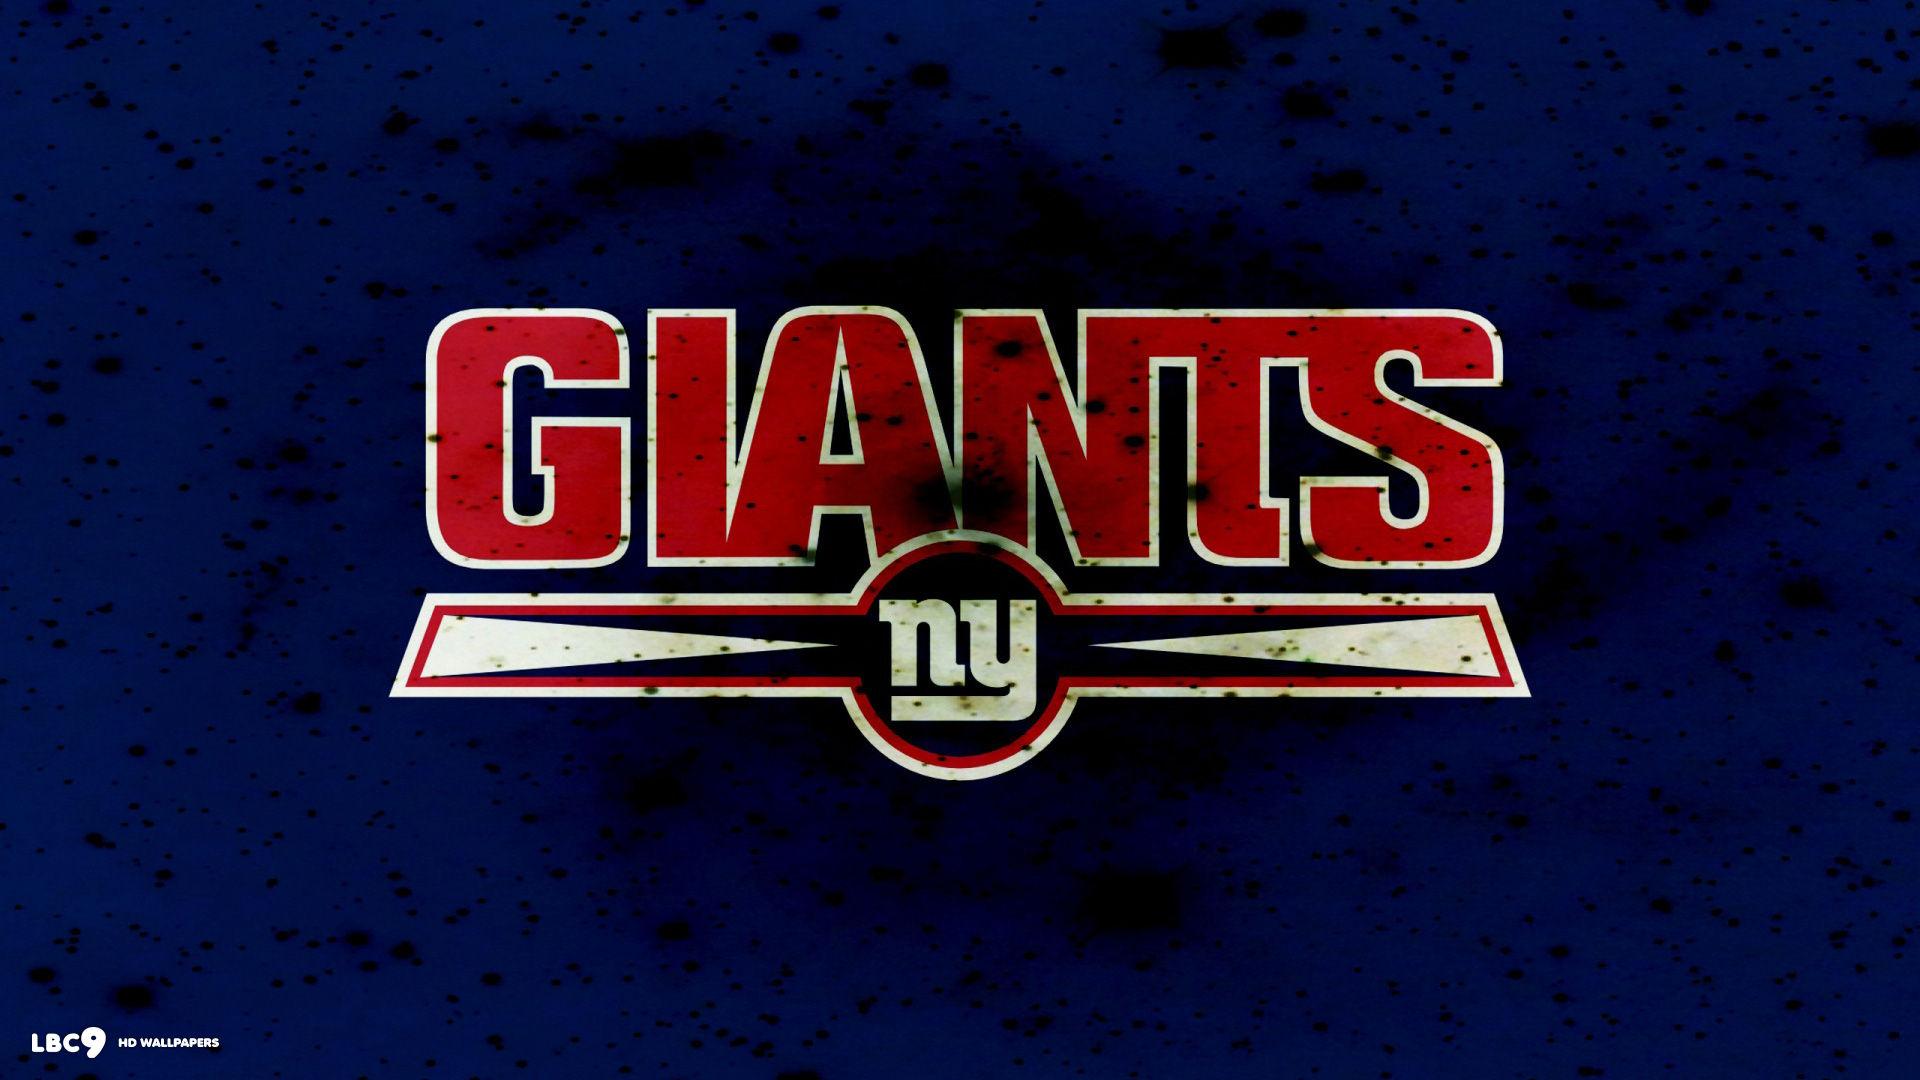 Tom Brady Wallpaper Iphone 7 New York Giants Nfl Football Fh Wallpaper 1920x1080